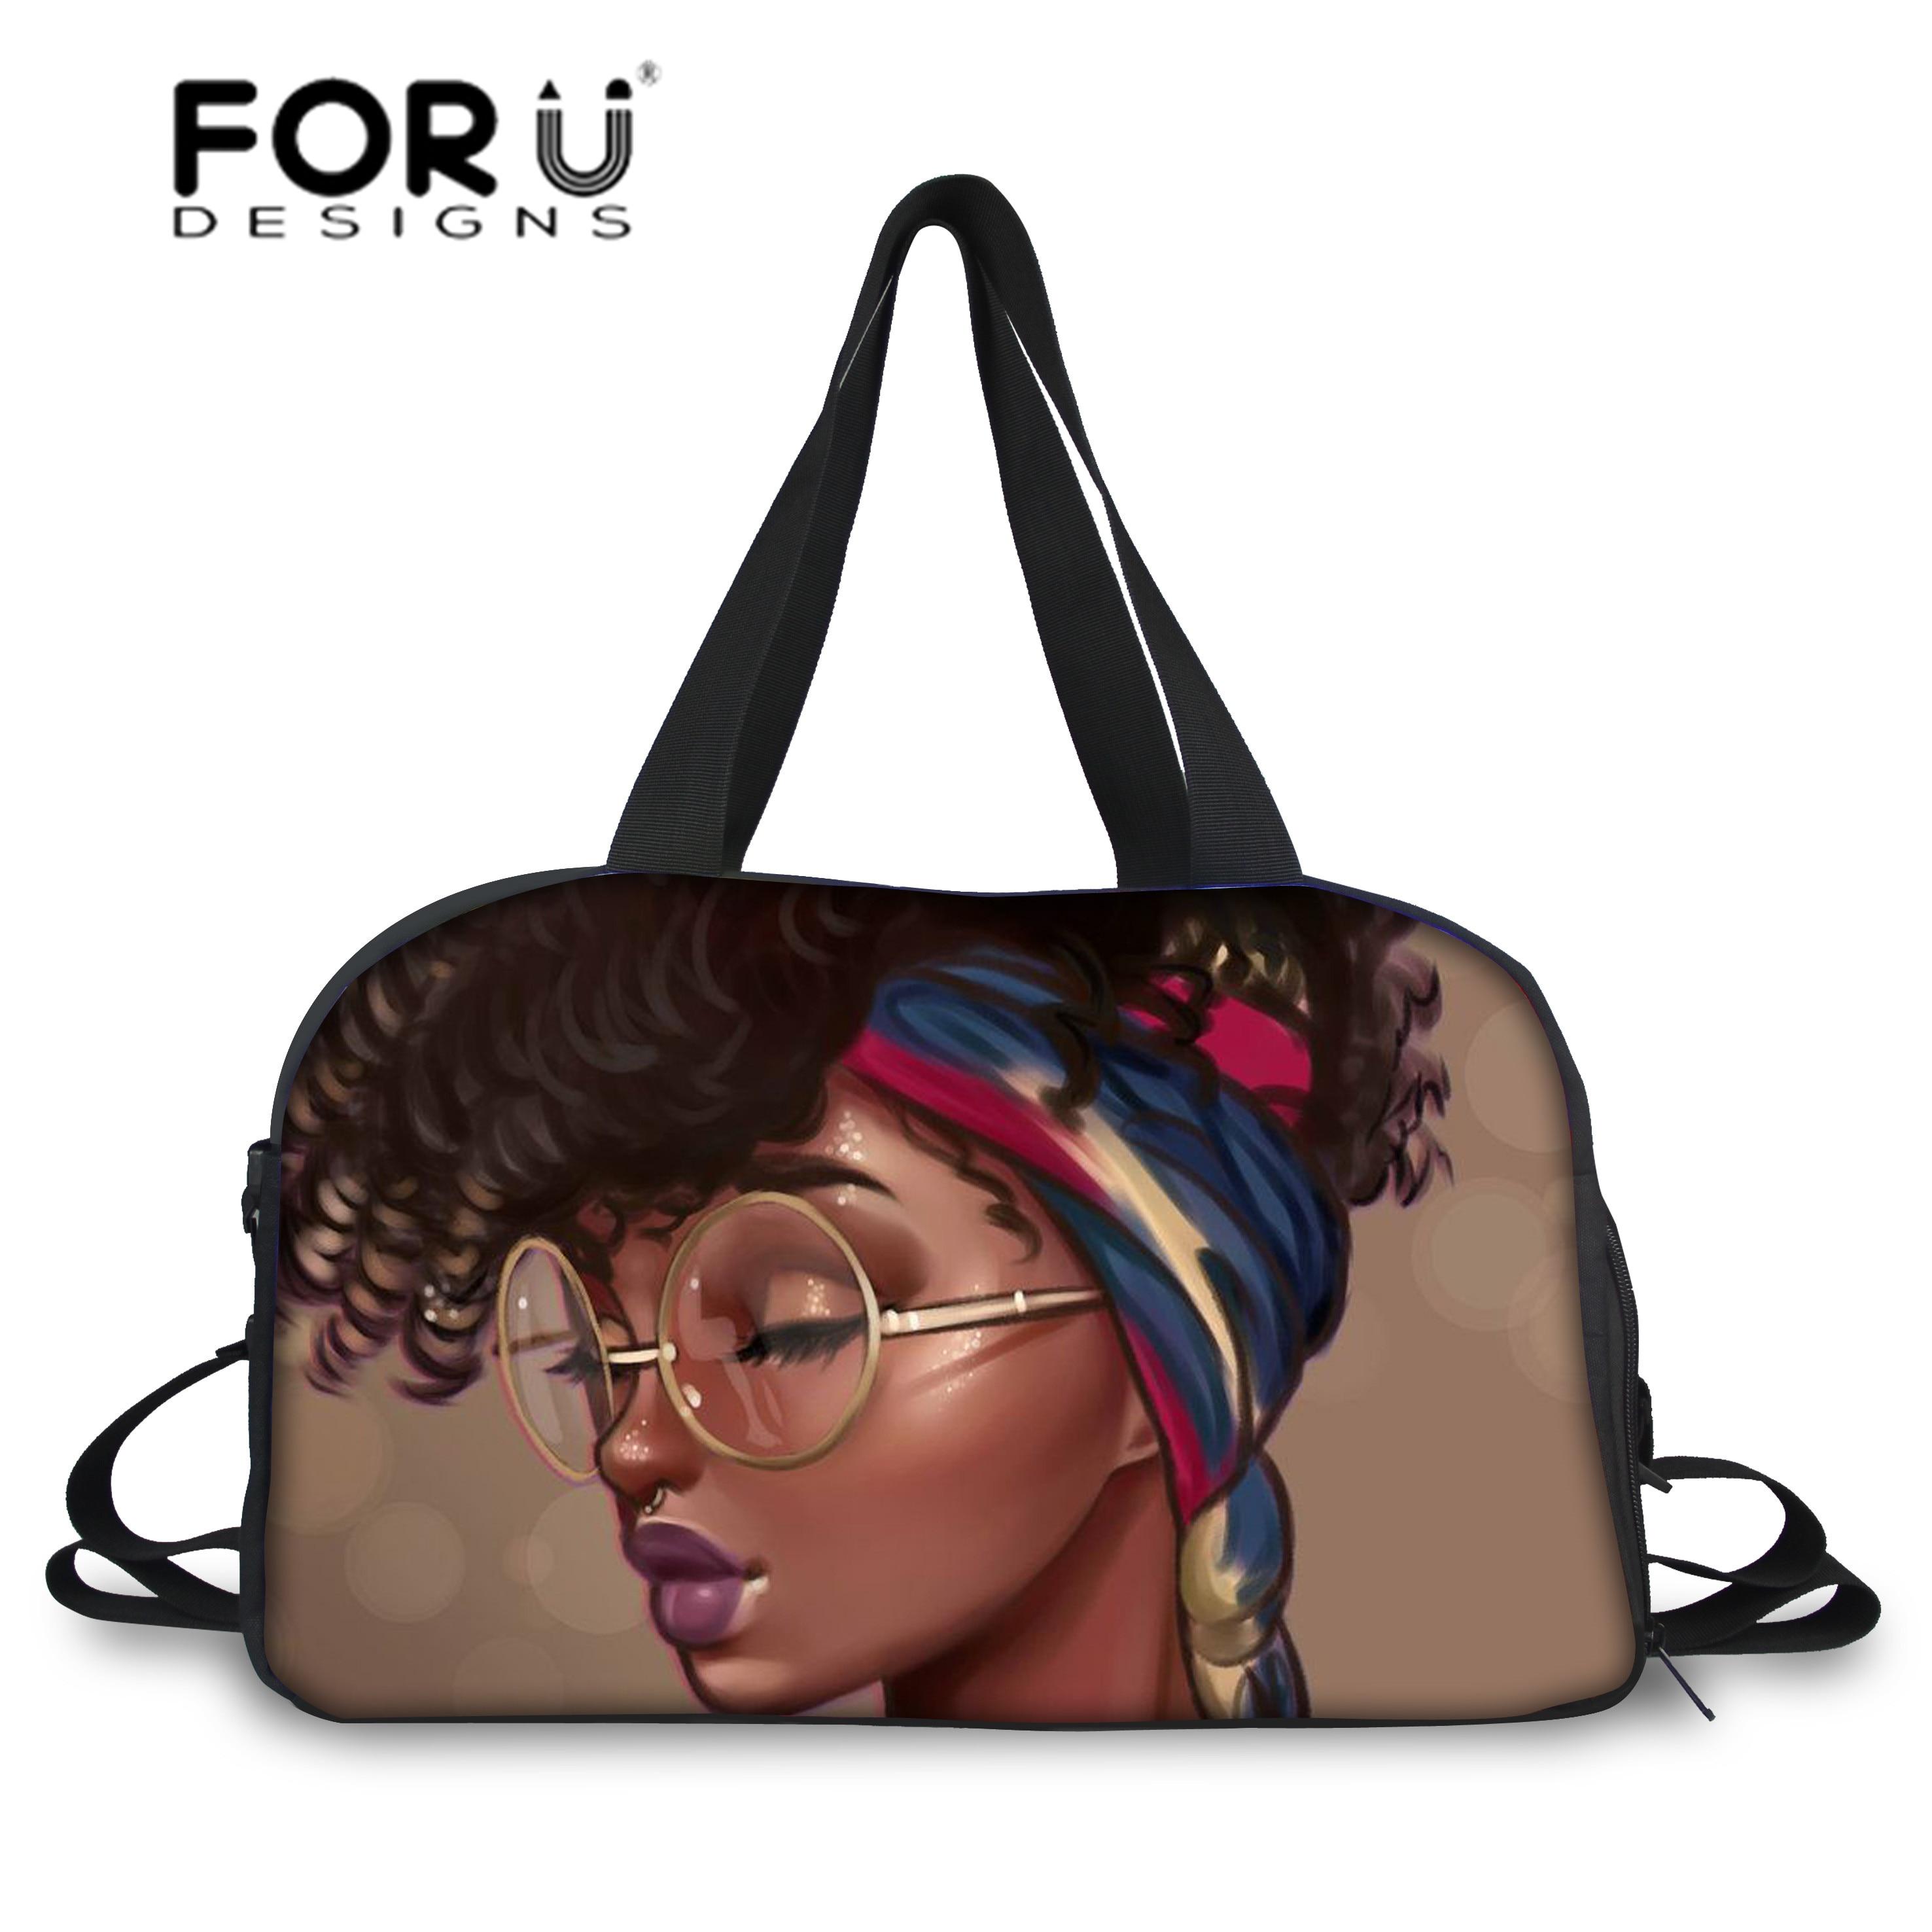 FORUDESIGNS Portable Travel Bags For Women Black Art African Girls Printing Trip Bag Ladies Gym Bag Totes Females Duffel Bags